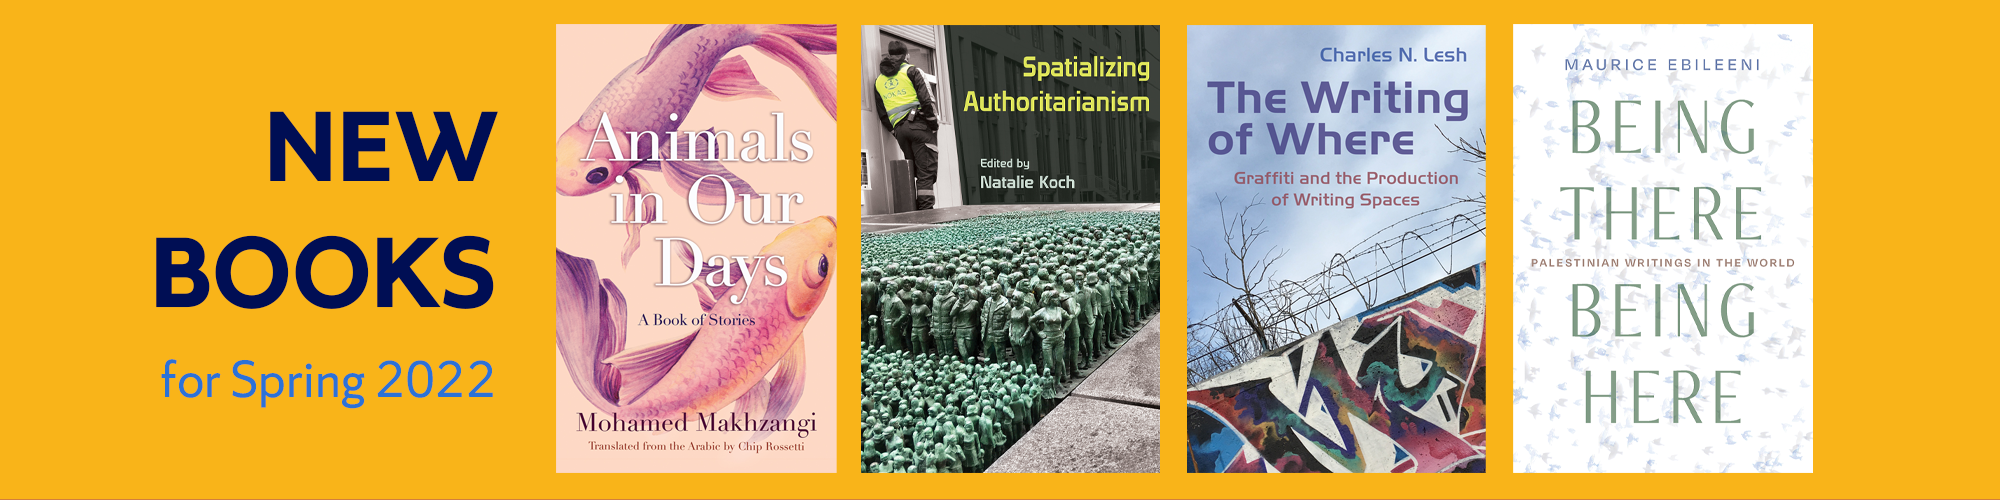 New books for Spring 2022